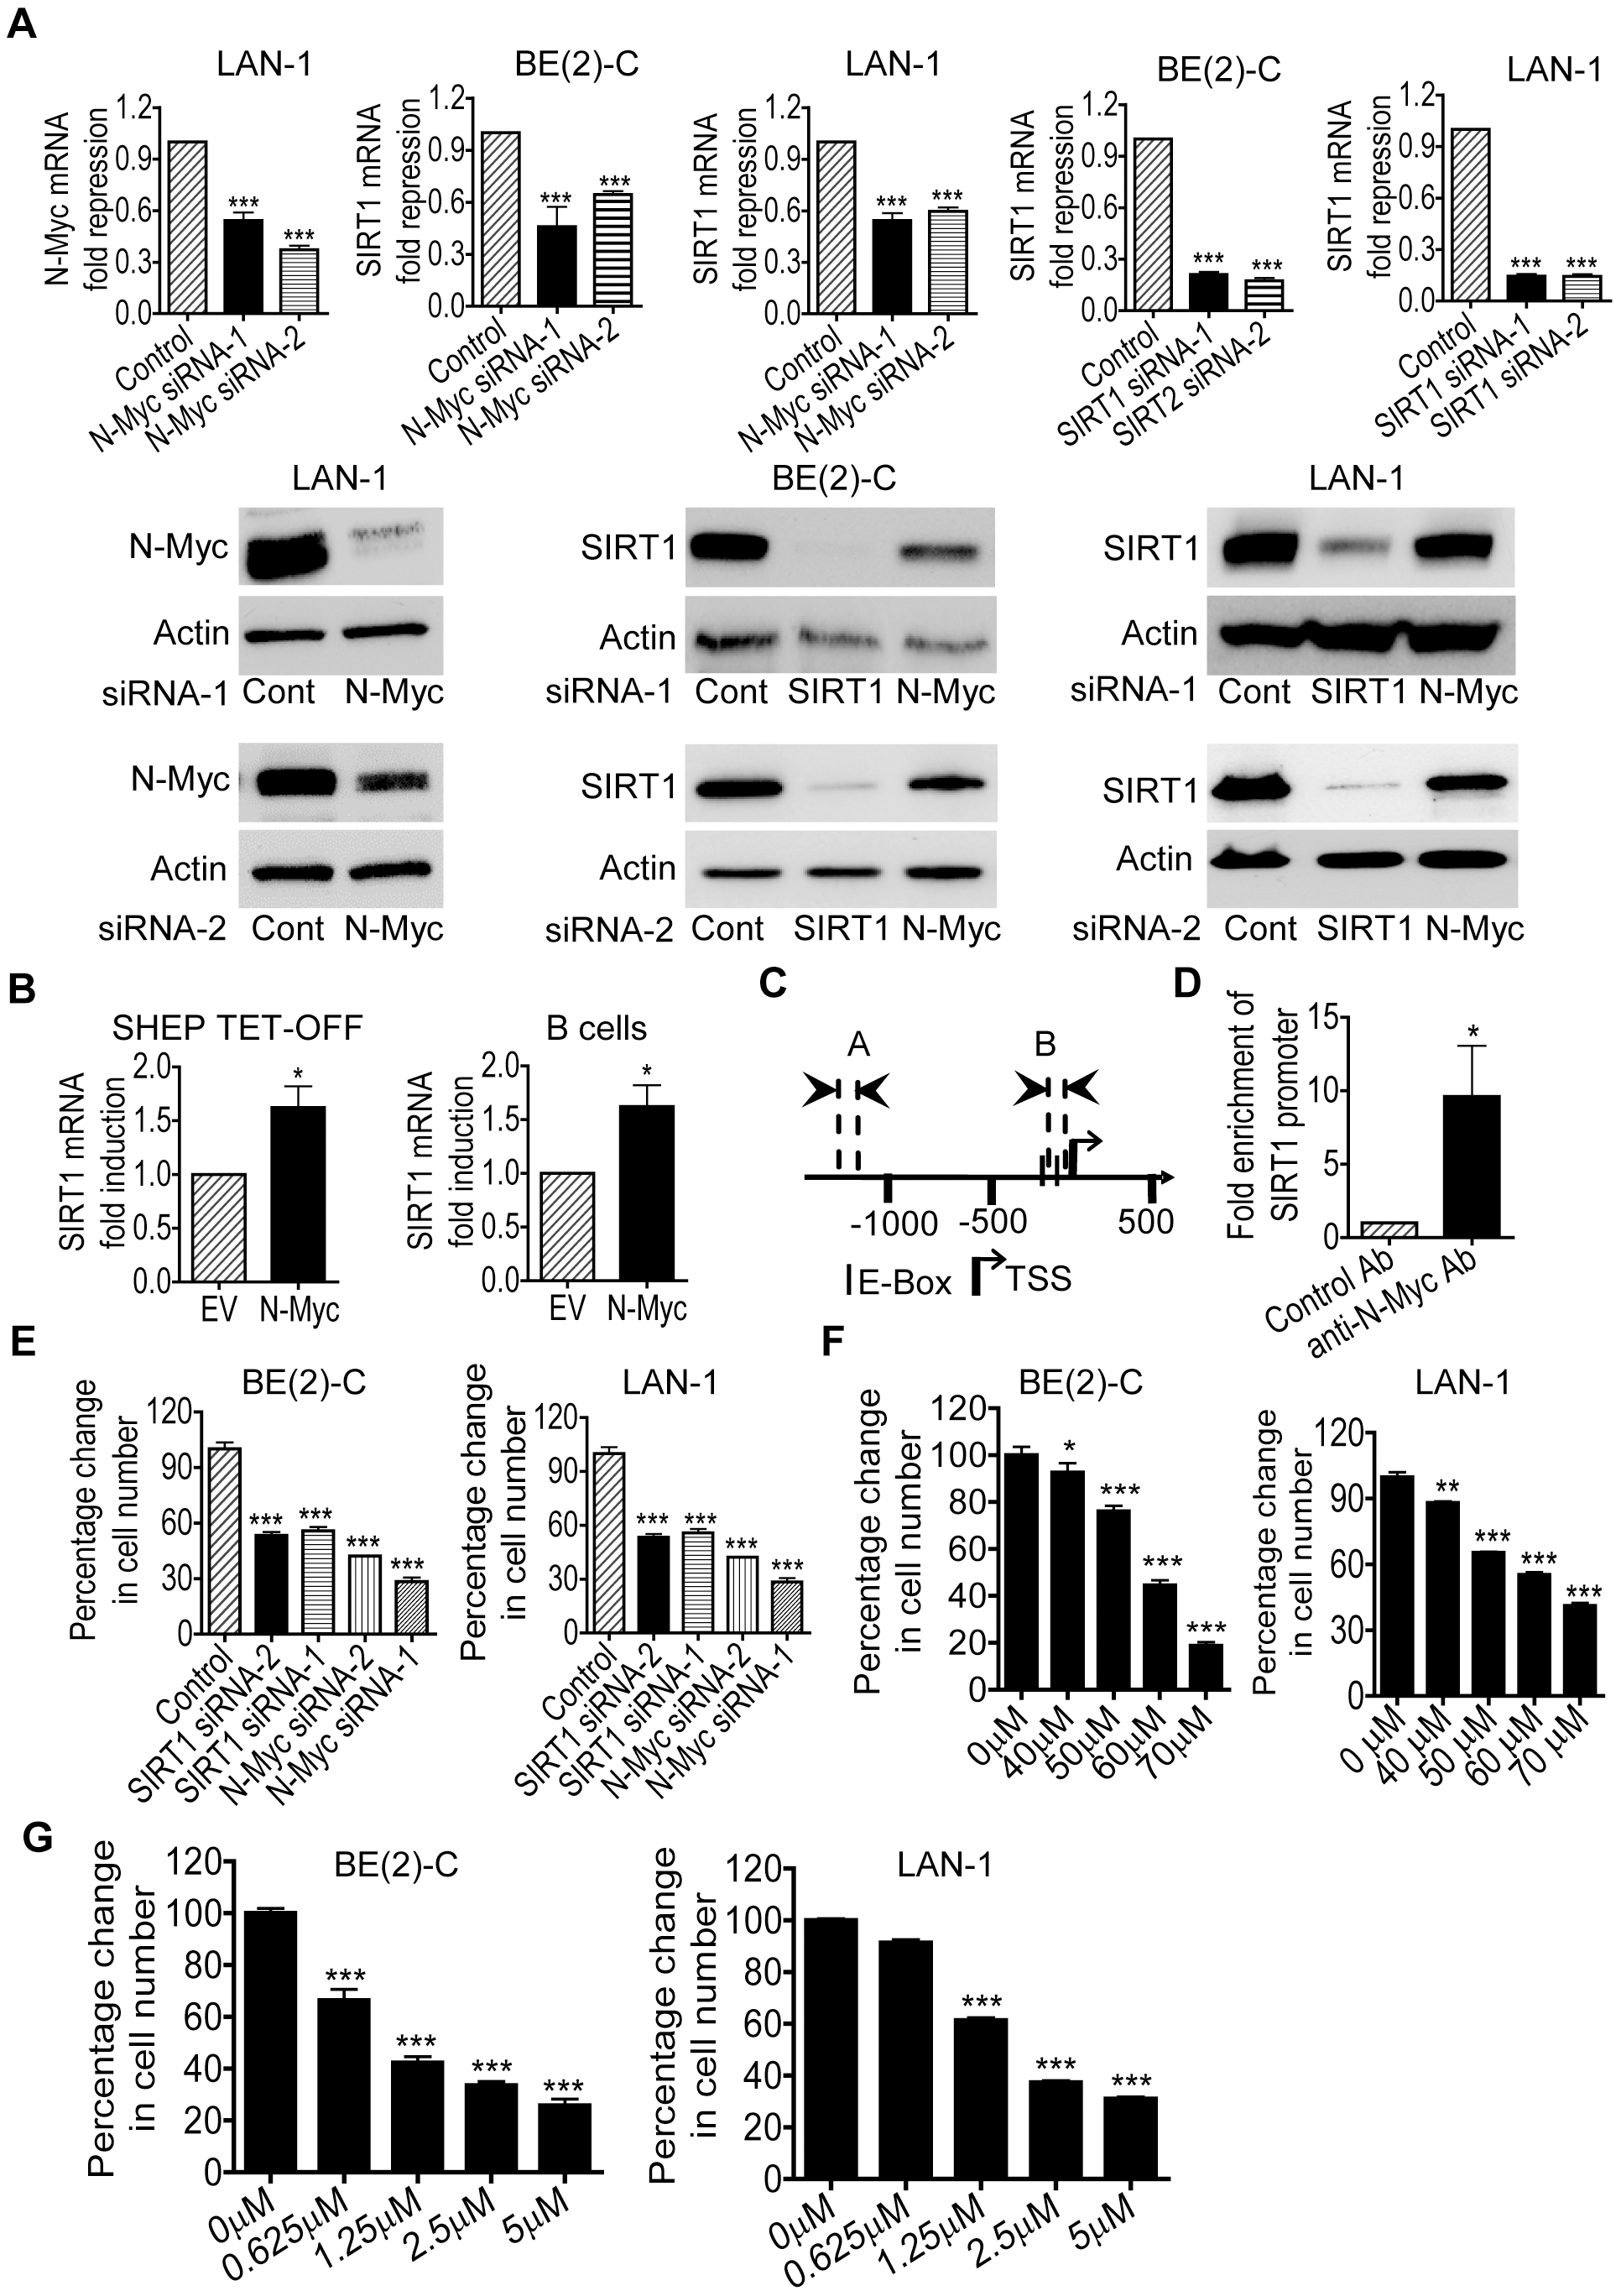 Transcriptional up-regulation of SIRT1 promotes neuroblastoma cell proliferation.